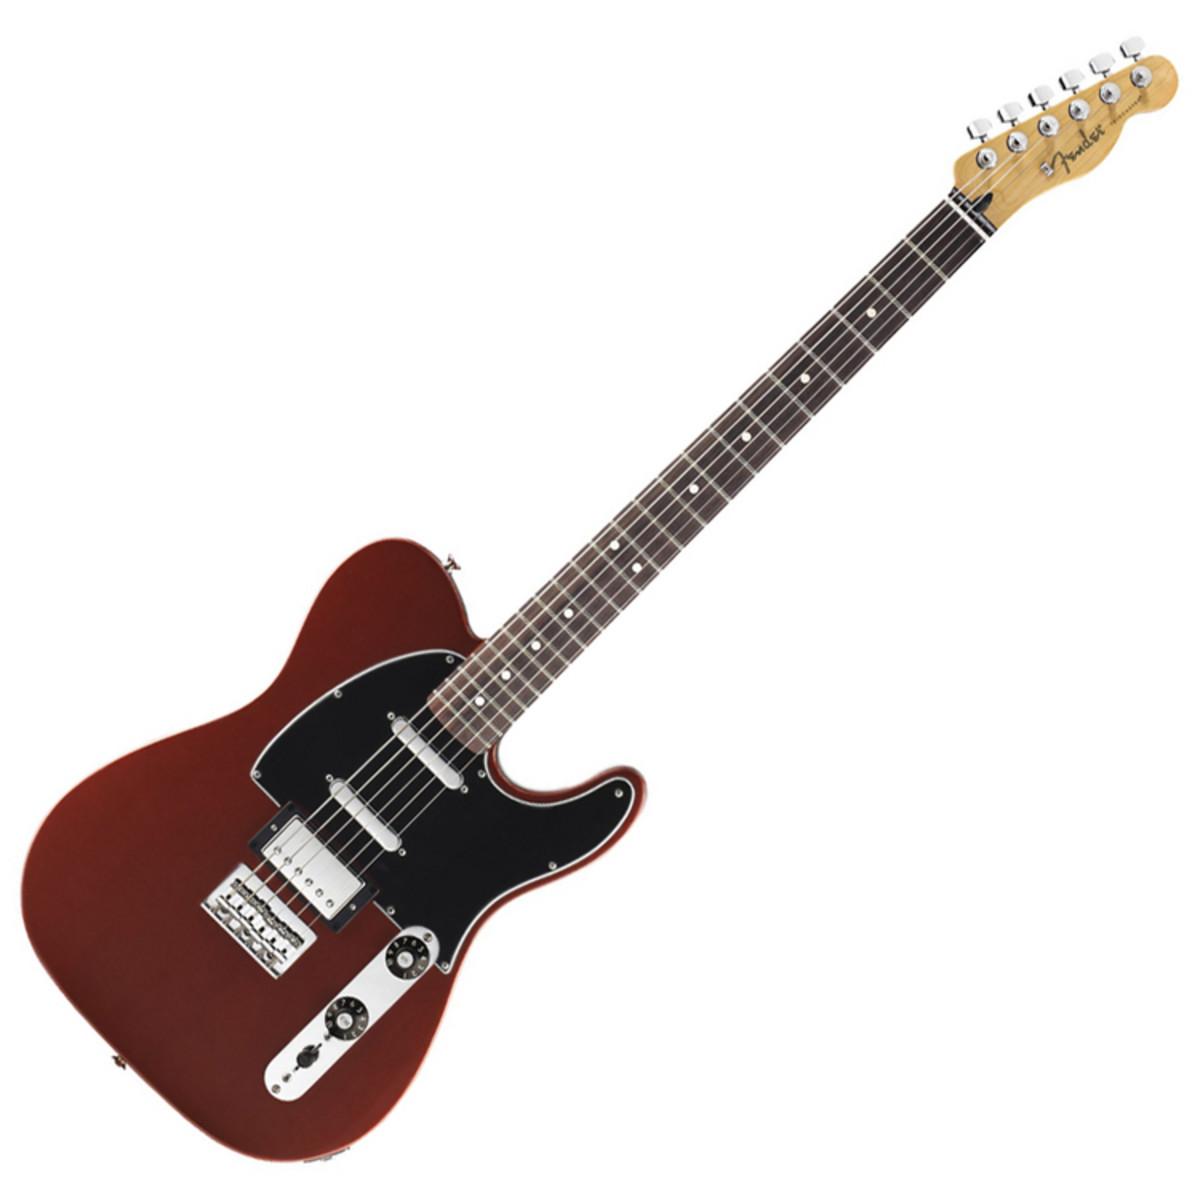 Fender Blacktop Telecaster Wiring Excellent Electrical Wire Diagram He Library Rh 38 Evitta De Jaguar Hh Jazzmaster